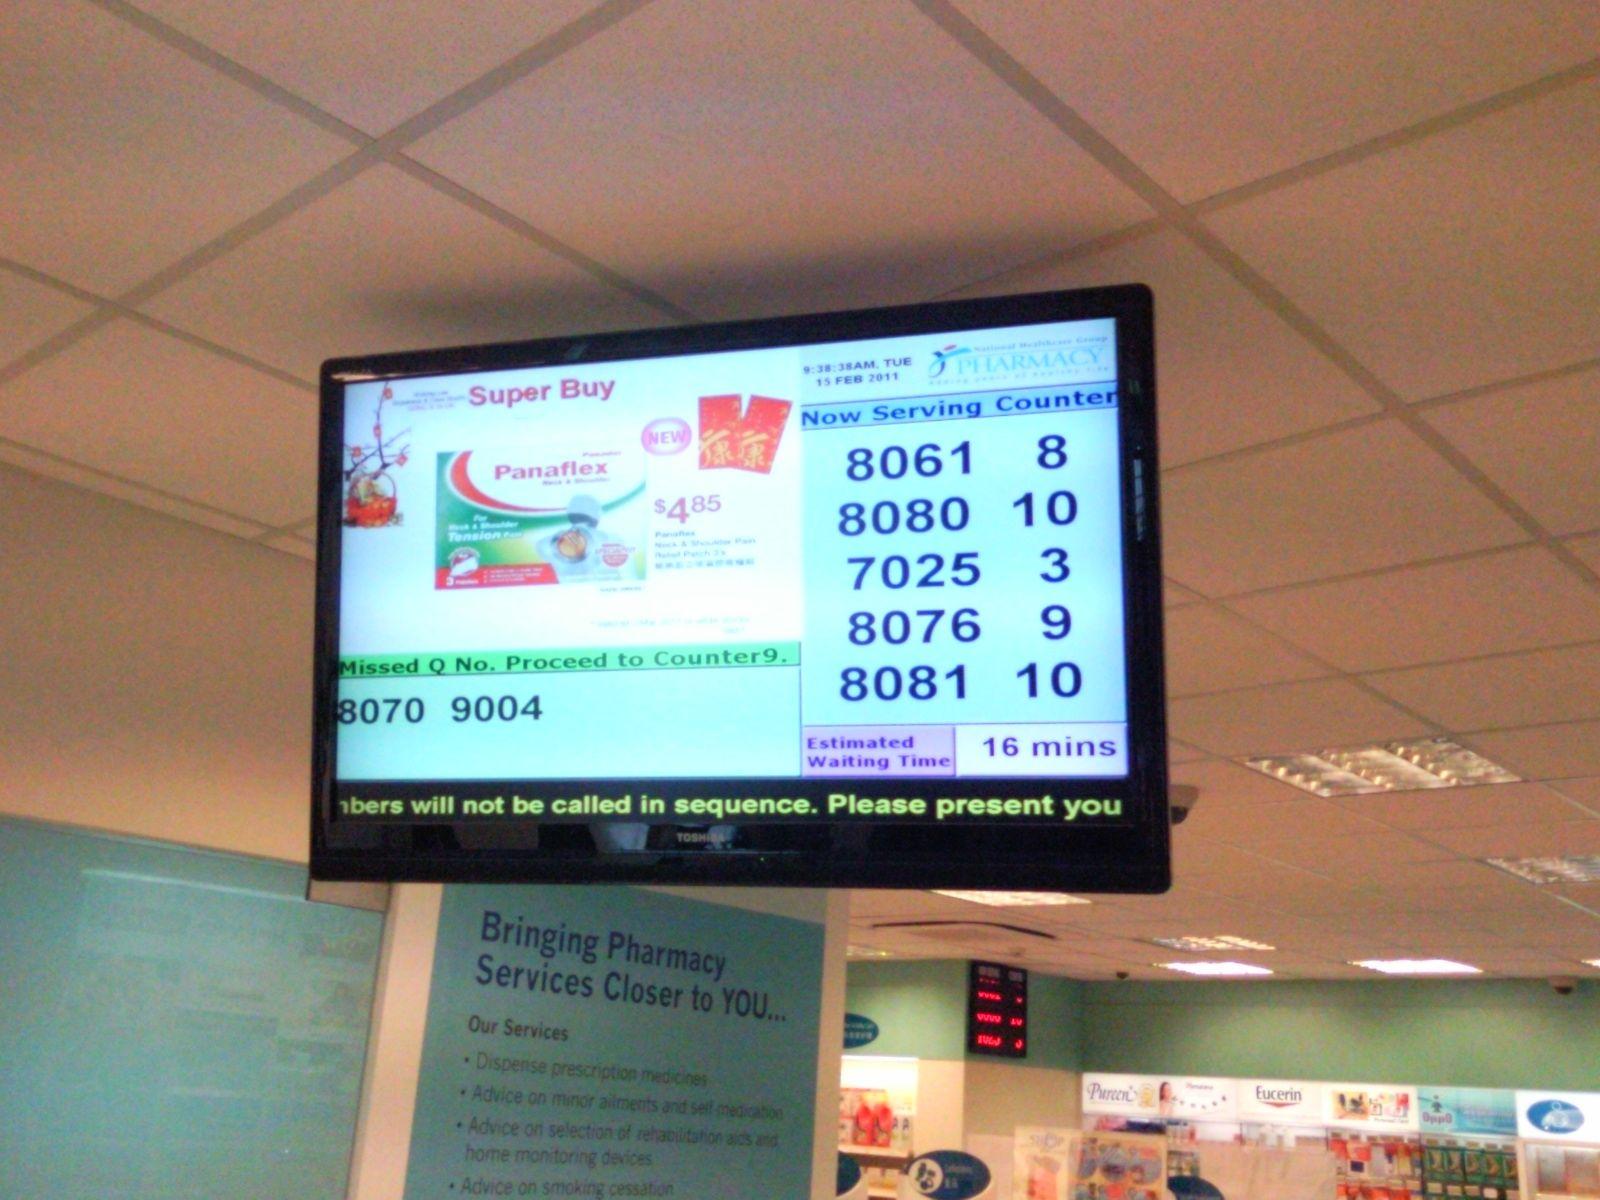 Hospital queue management systems help doctors and nursing